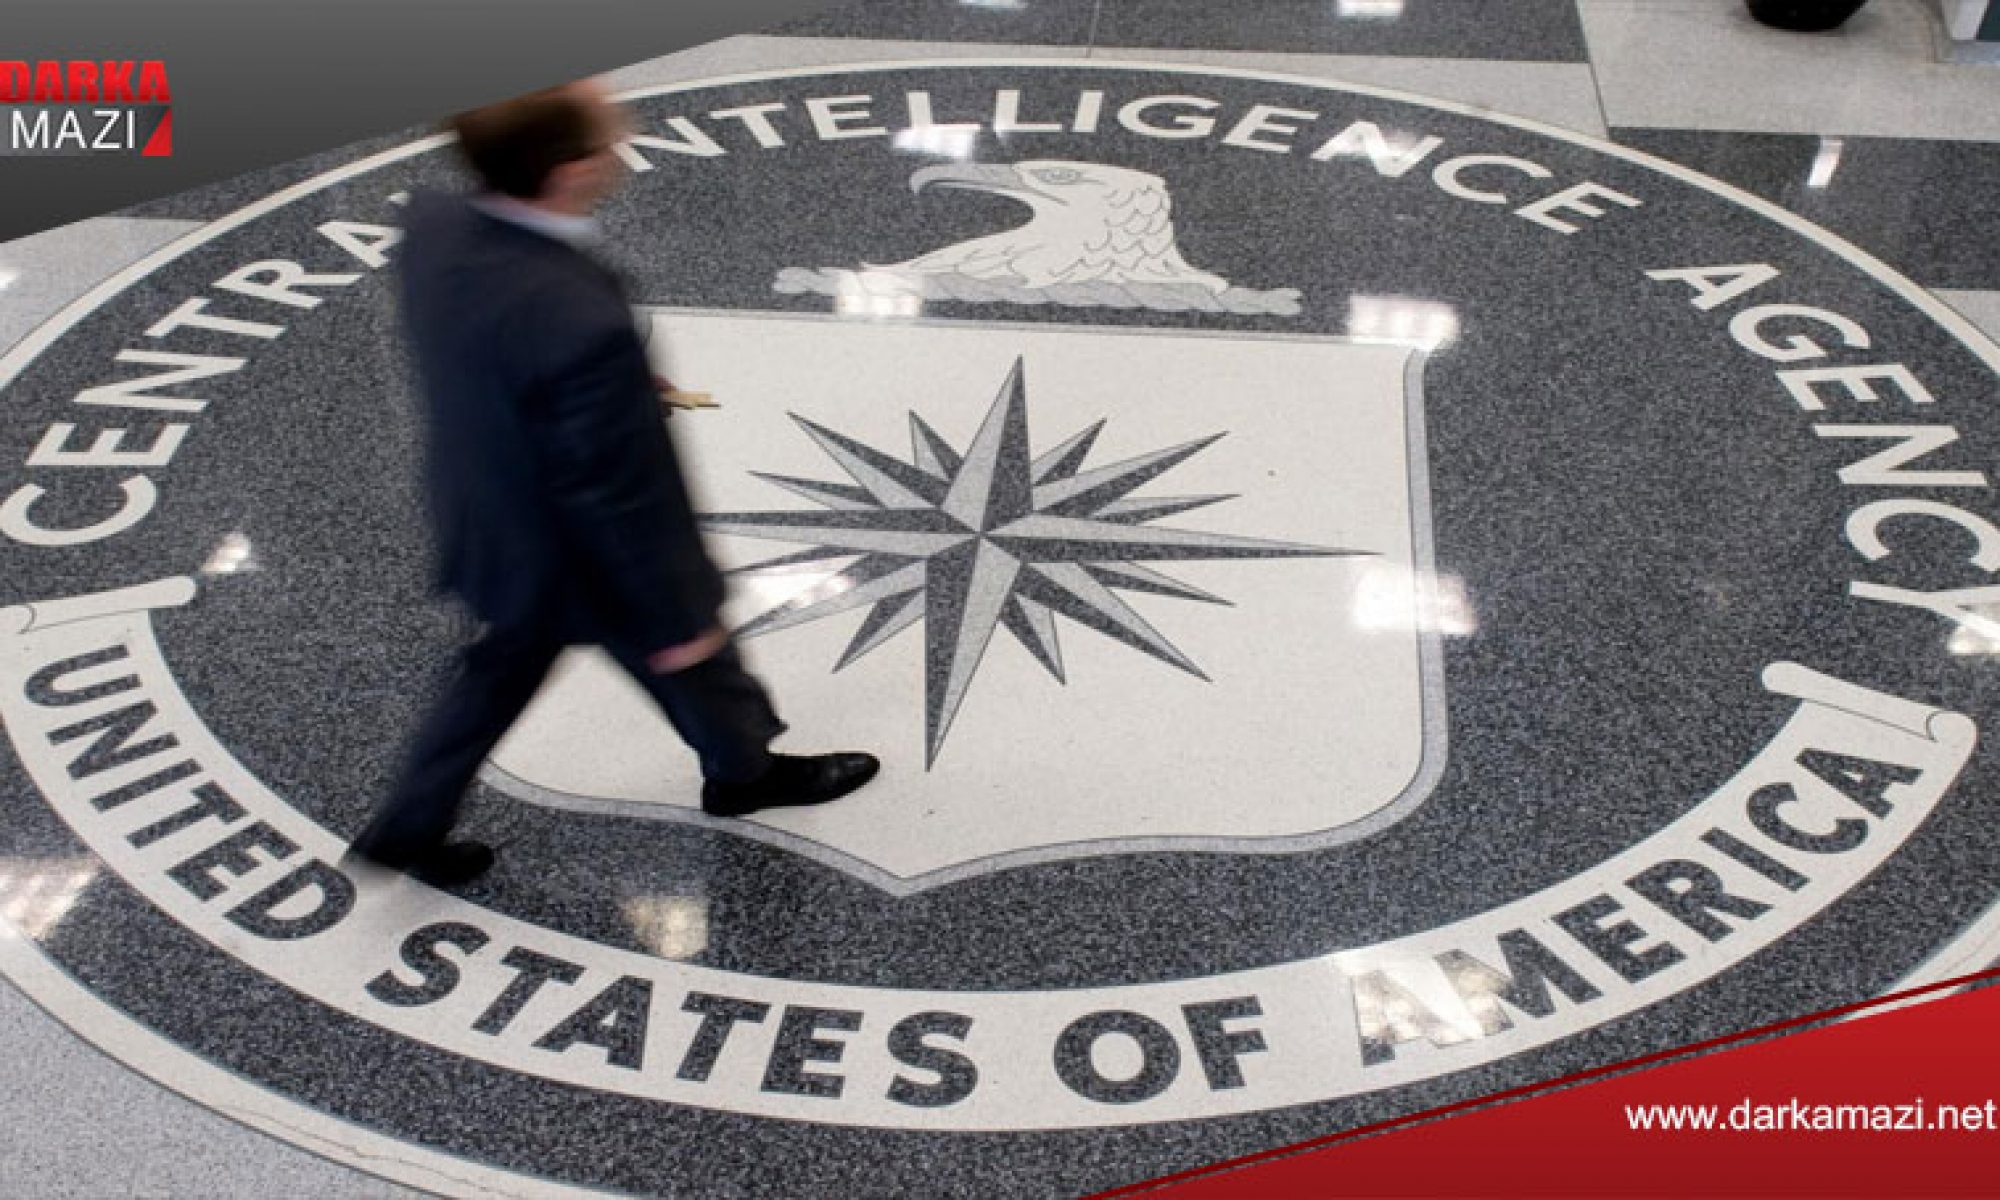 ئەفسەرێ بەرێ یێ CIA دانپێدان کر کو ژ بۆ چینێ سیخوری کریە